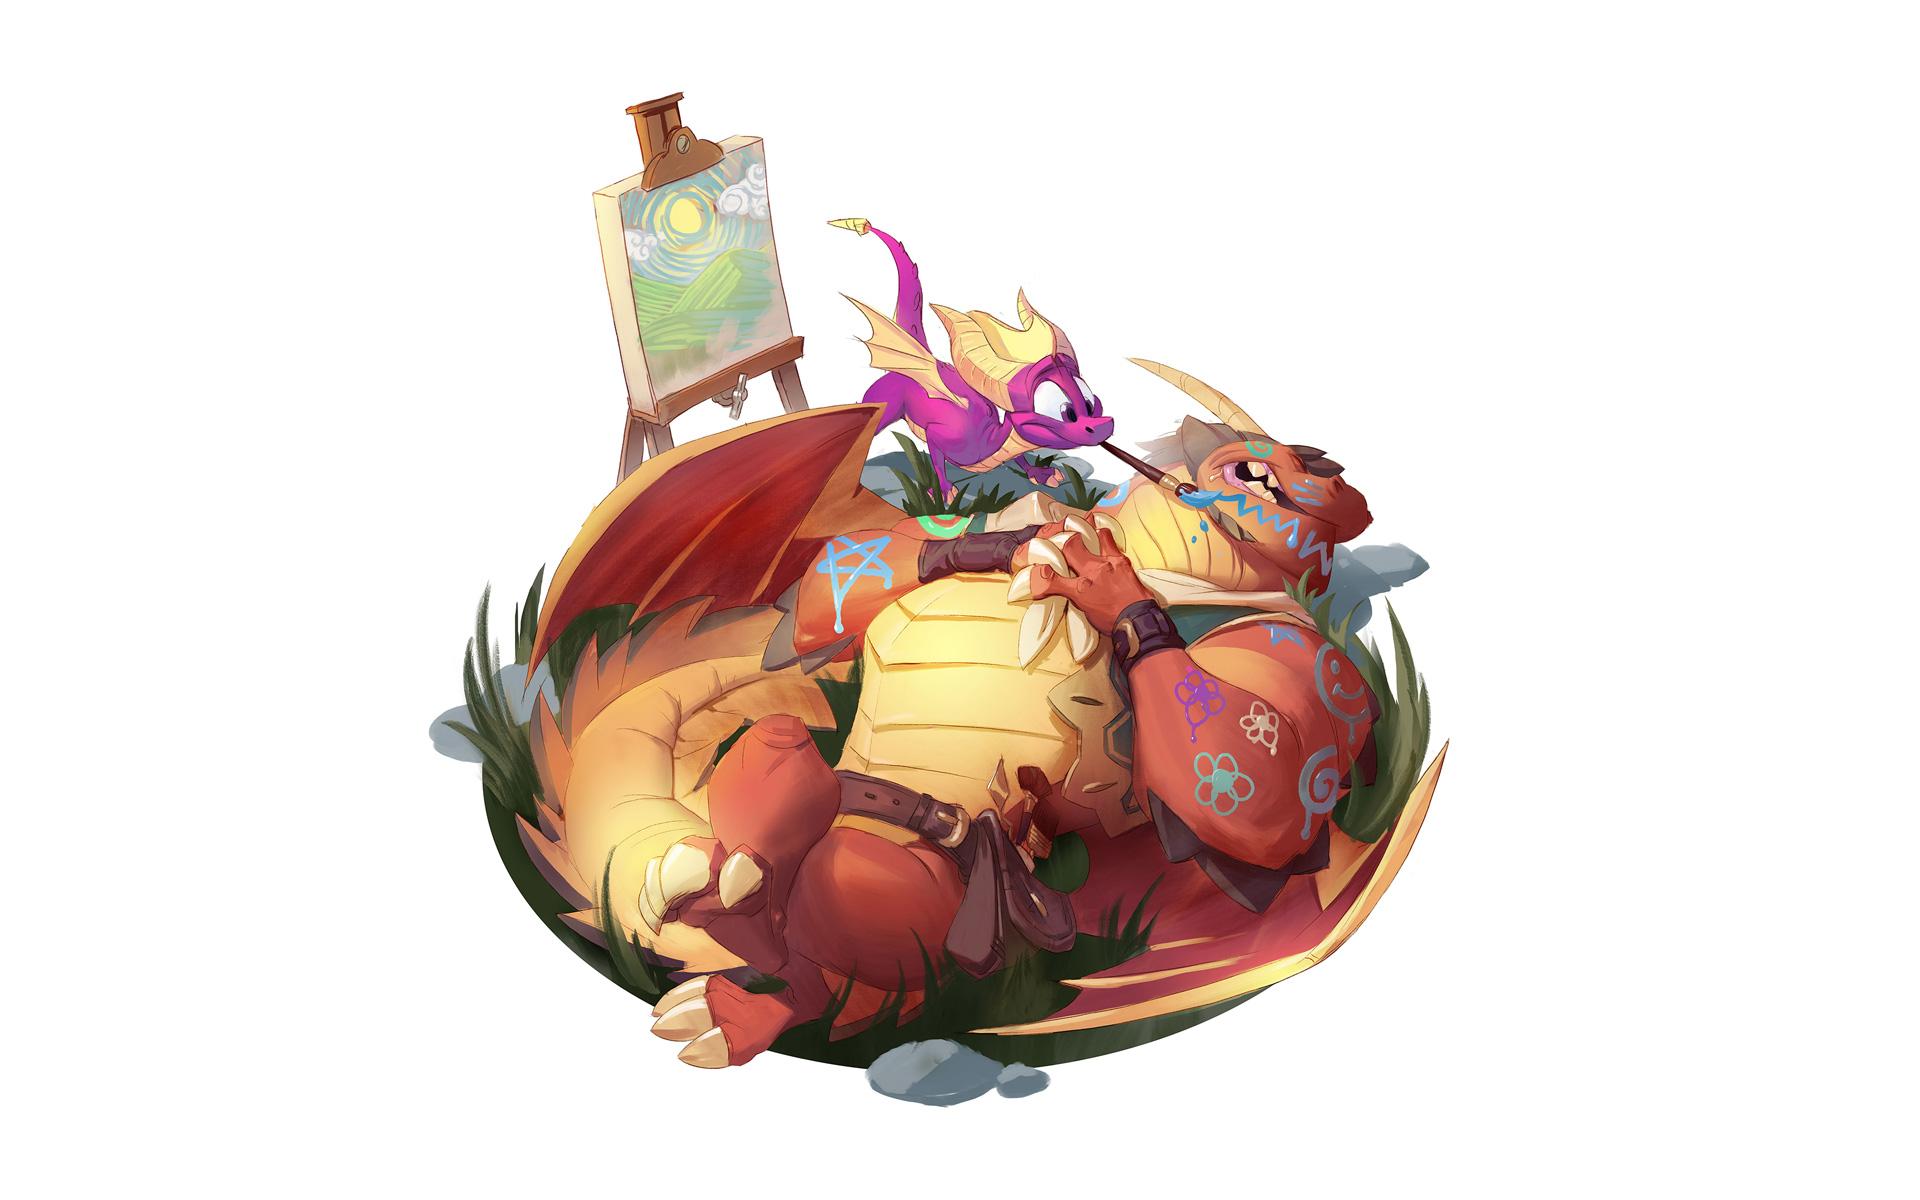 Free Spyro the Dragon Wallpaper in 1920x1200